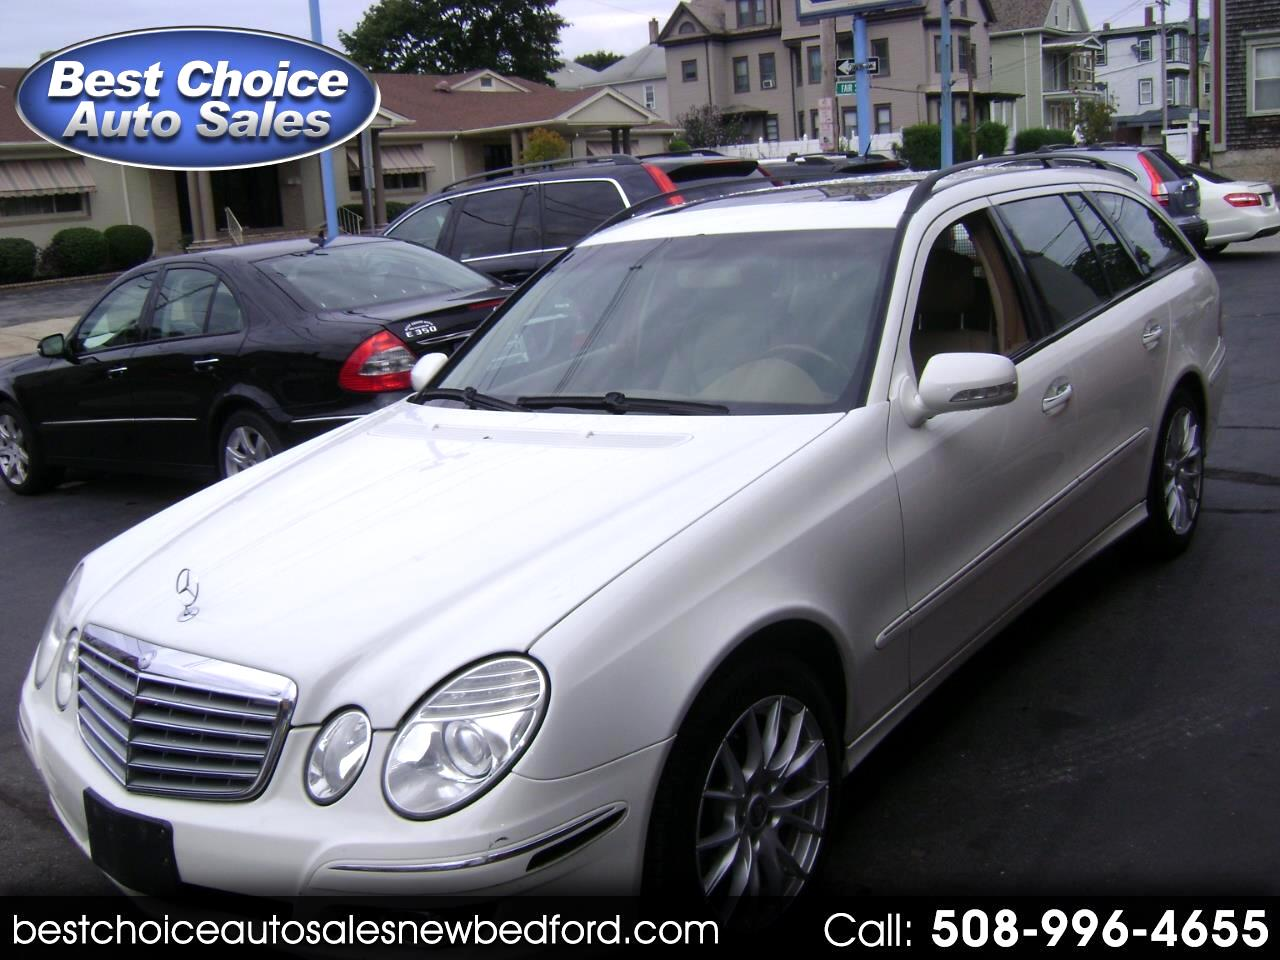 2008 Mercedes-Benz E-Class Wagon E350 4Matic